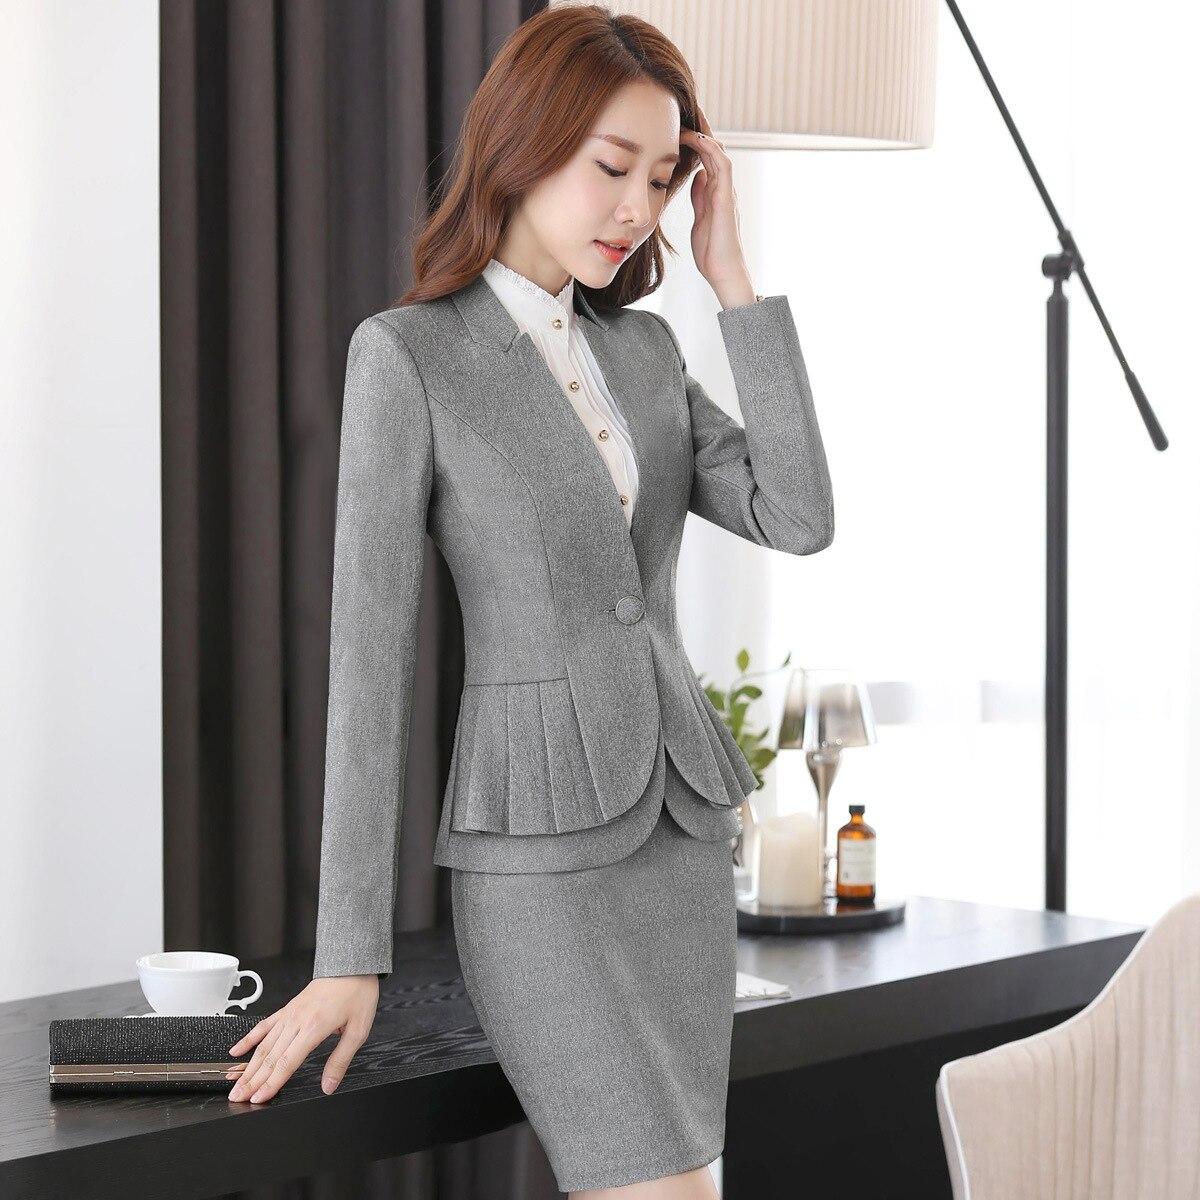 Professional Women Skirt Suits Blazers Autumn Business Ladies Office Work Wear White collar (jacket/Skirt /shirt / pants) - 2